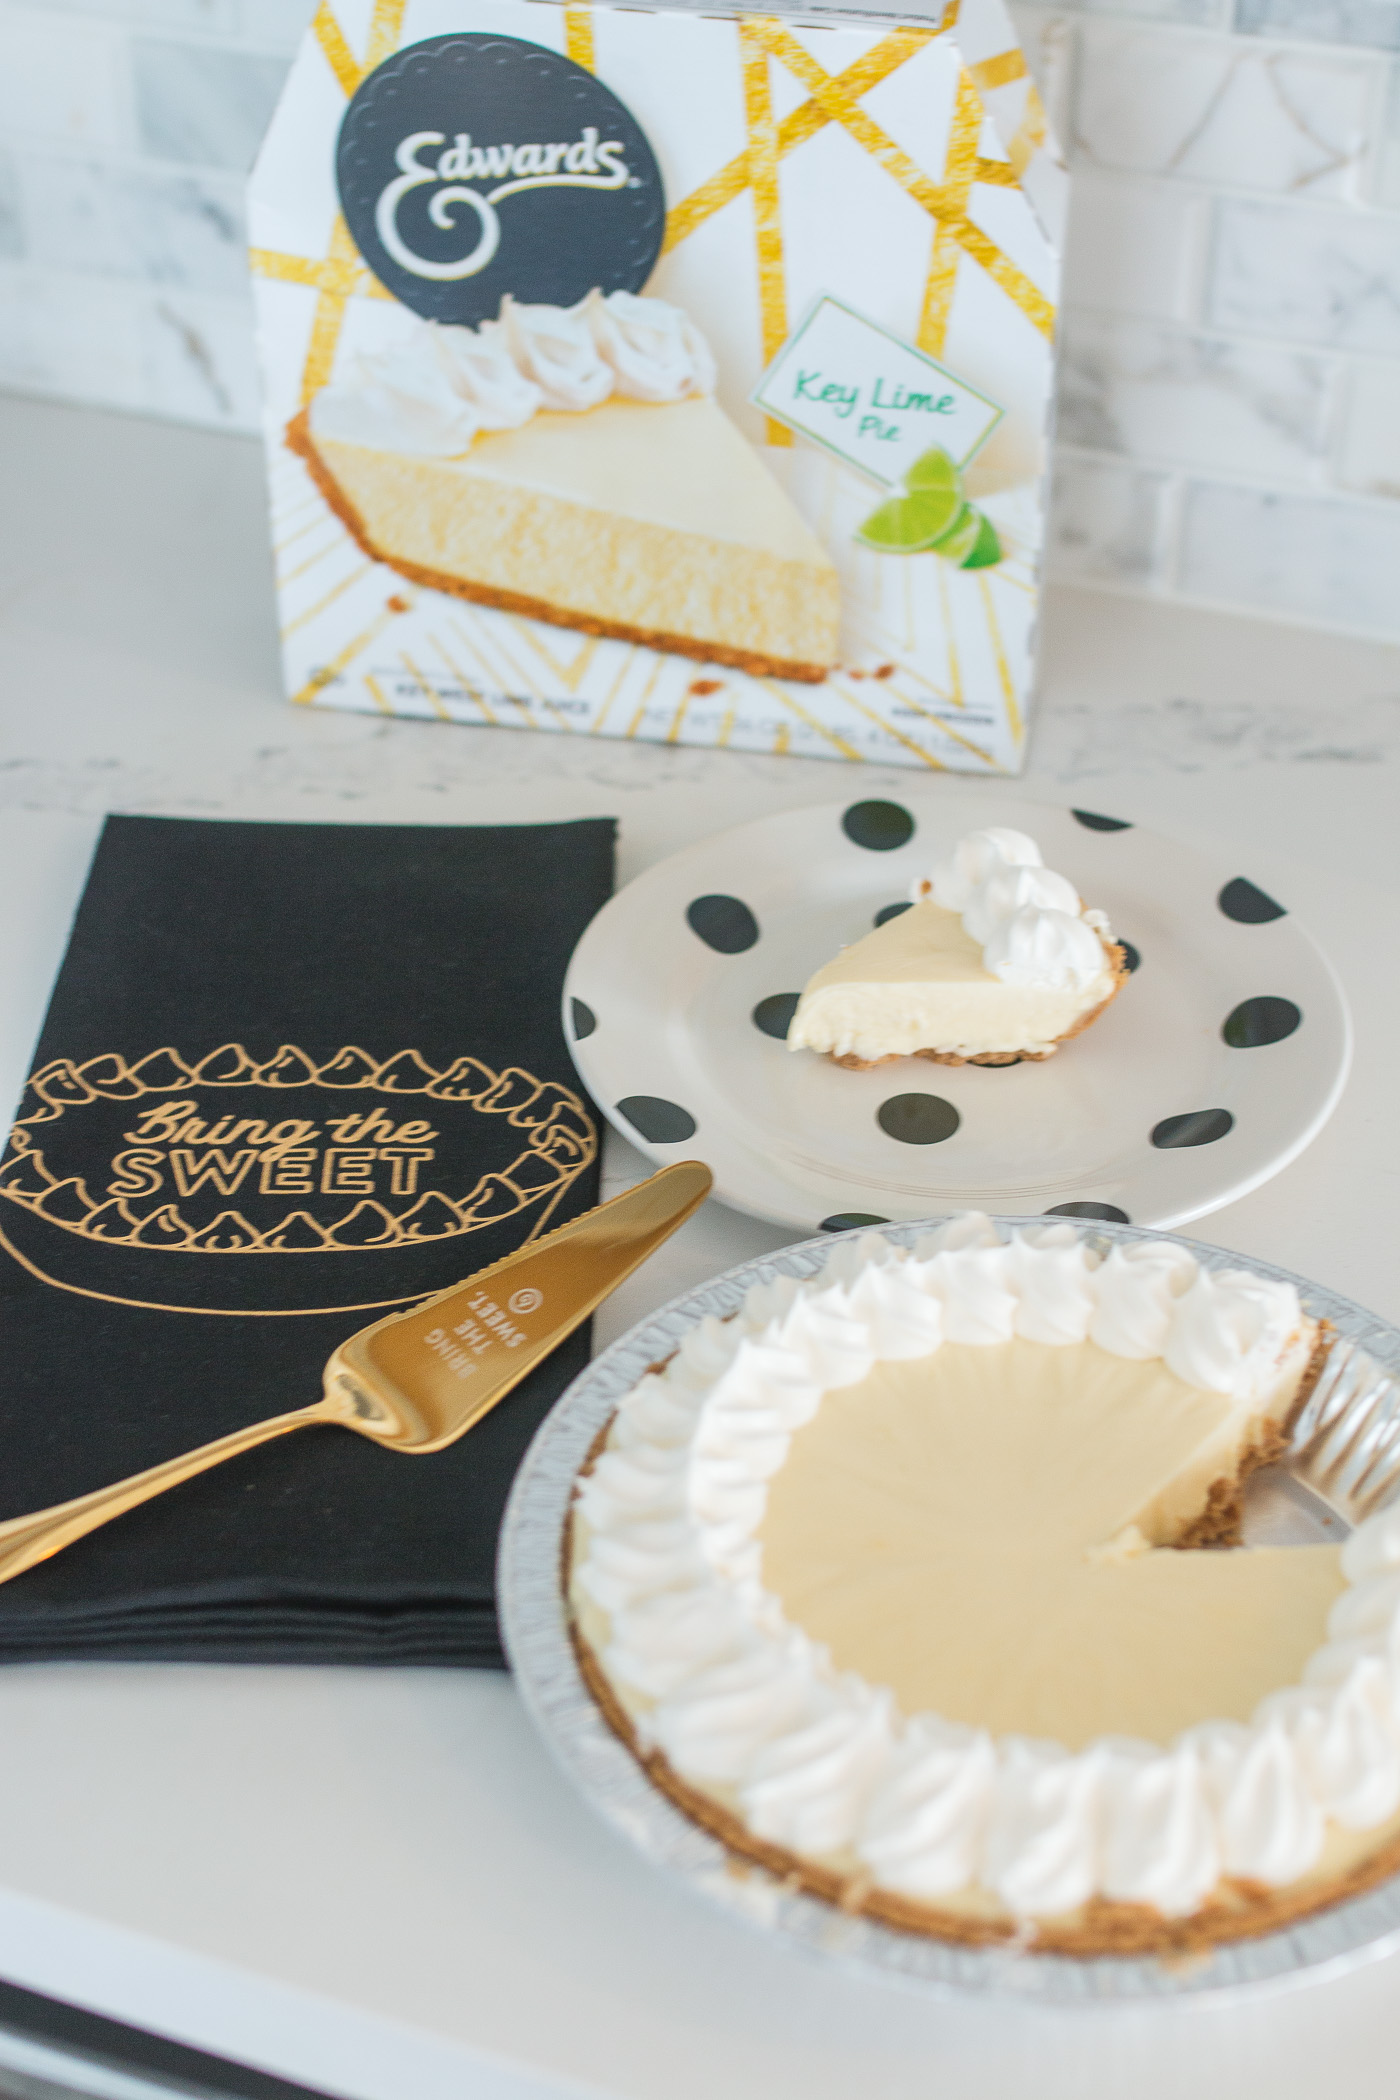 Edwards Desserts Key Lime Pie